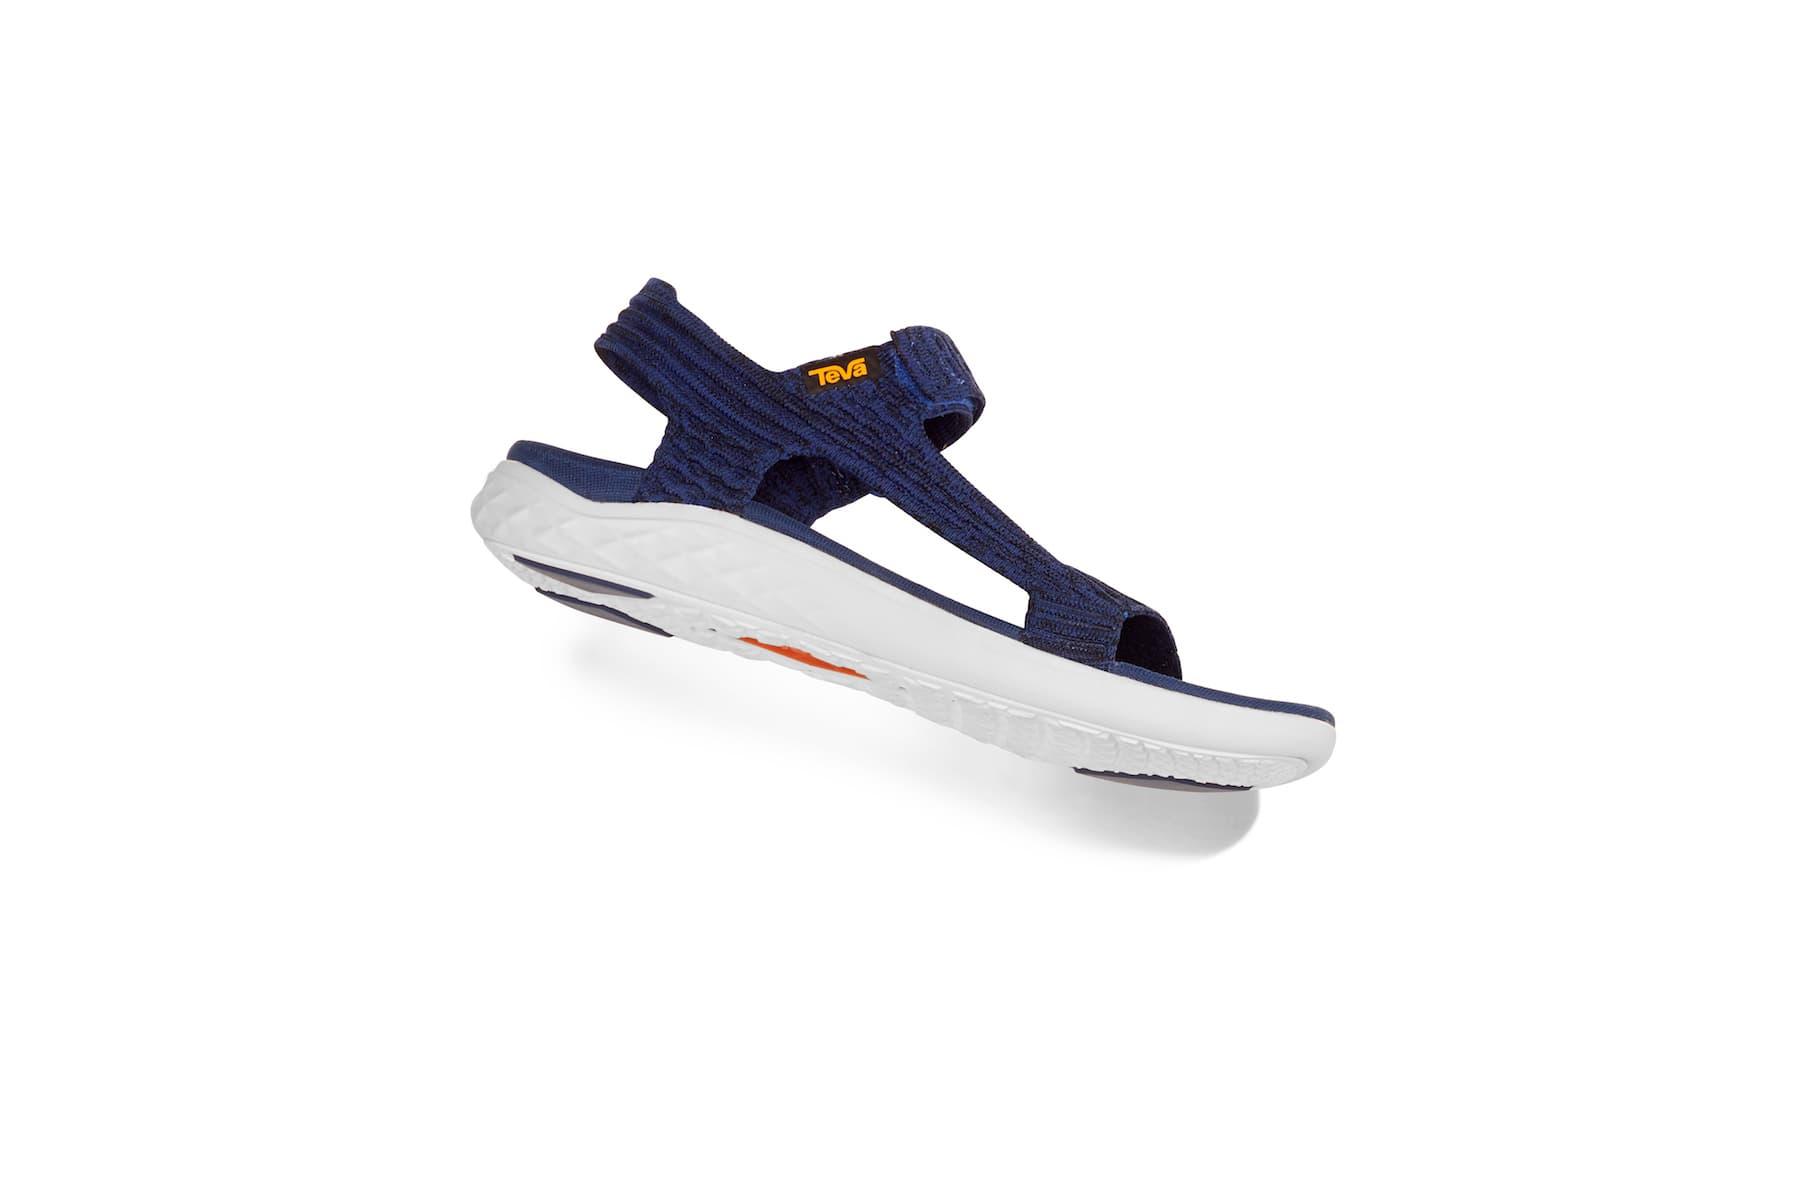 Teva 2018 春夏鞋履系列一覽